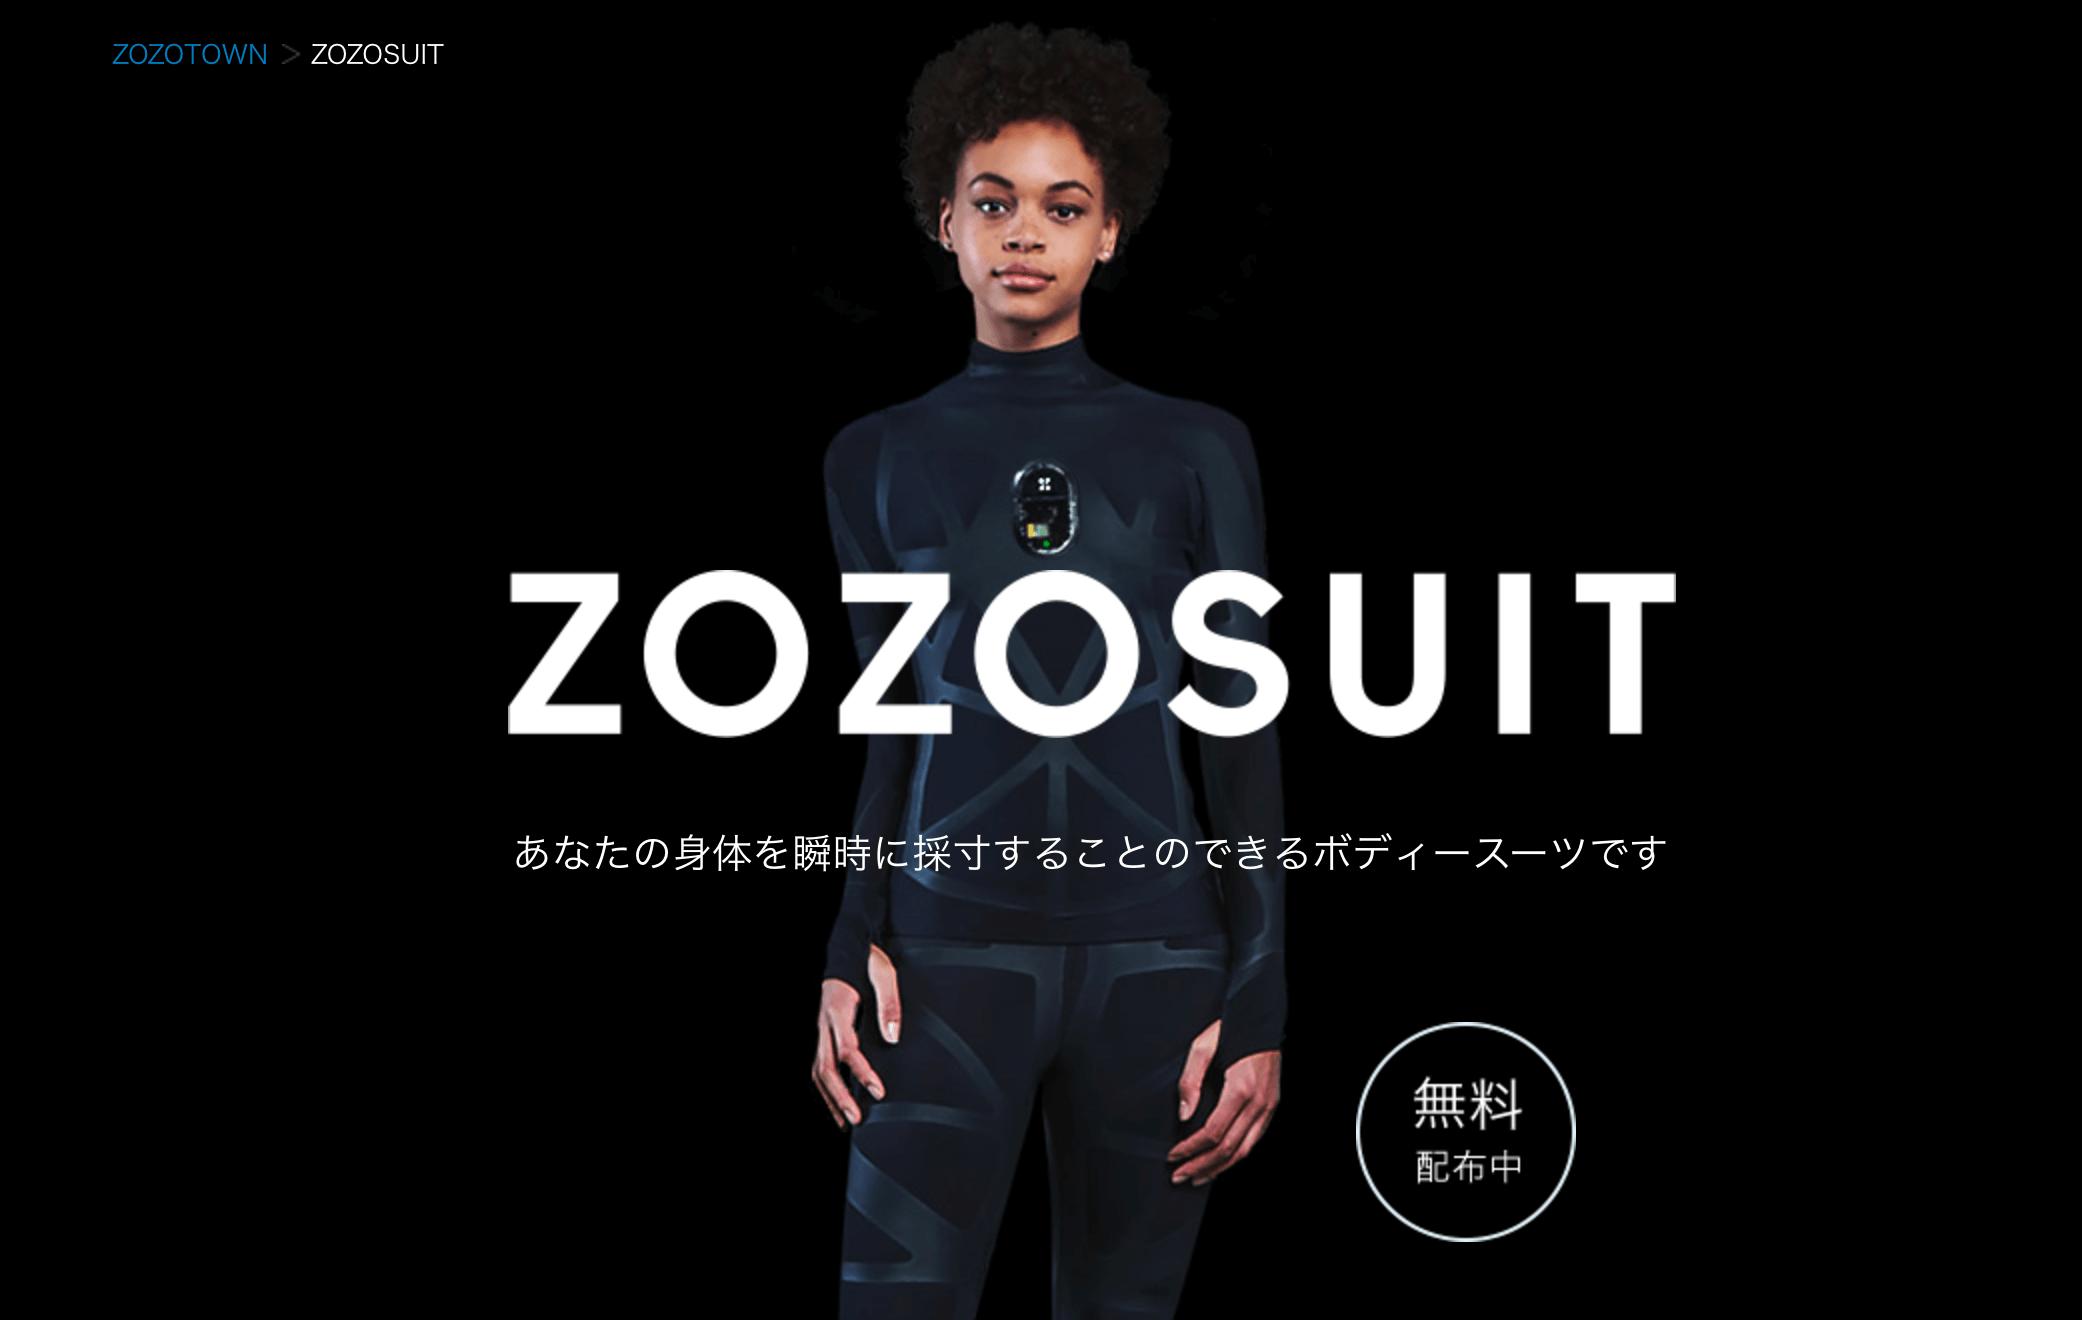 ZOZO SUIT(ゾゾスーツ)の狙いと実現した際の未来を考えてみた